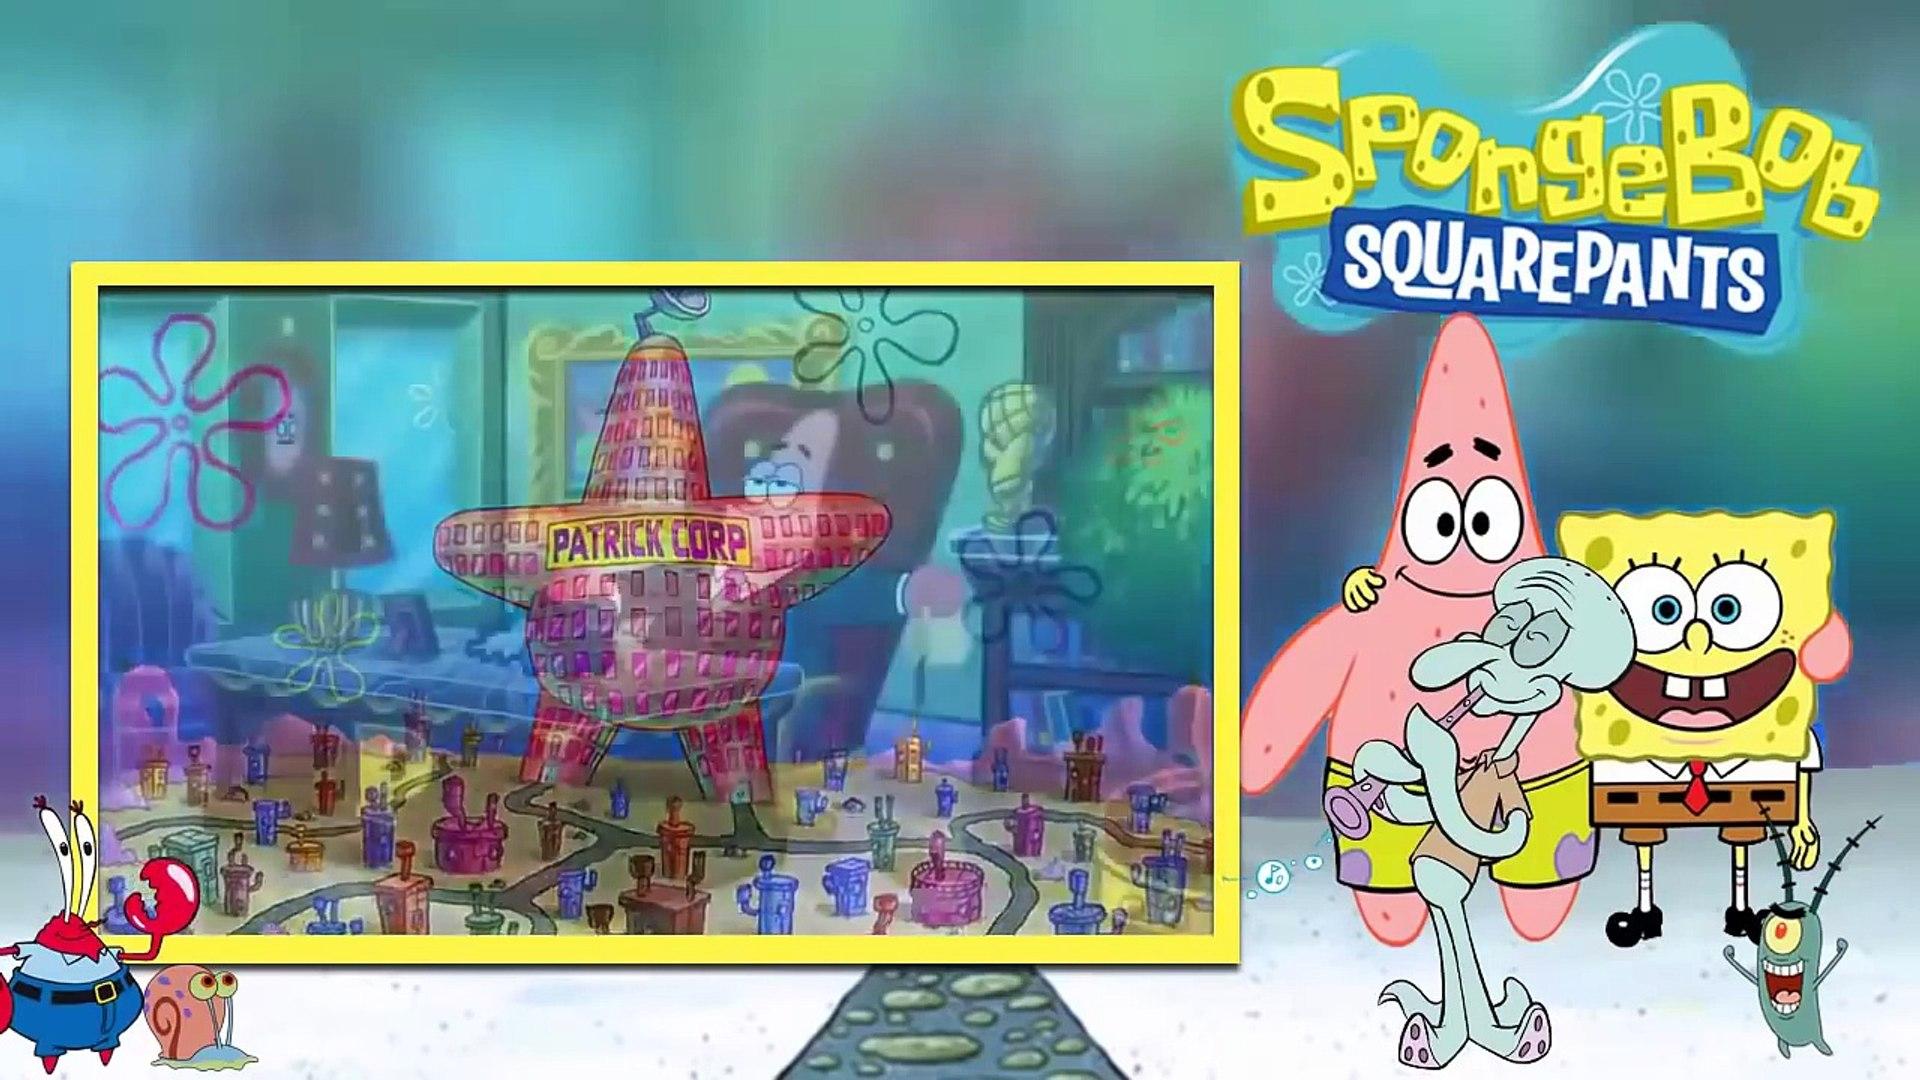 SpongeBob SquarePants New Full Episıdes S09E39 The Fish Bowl Married to  Money